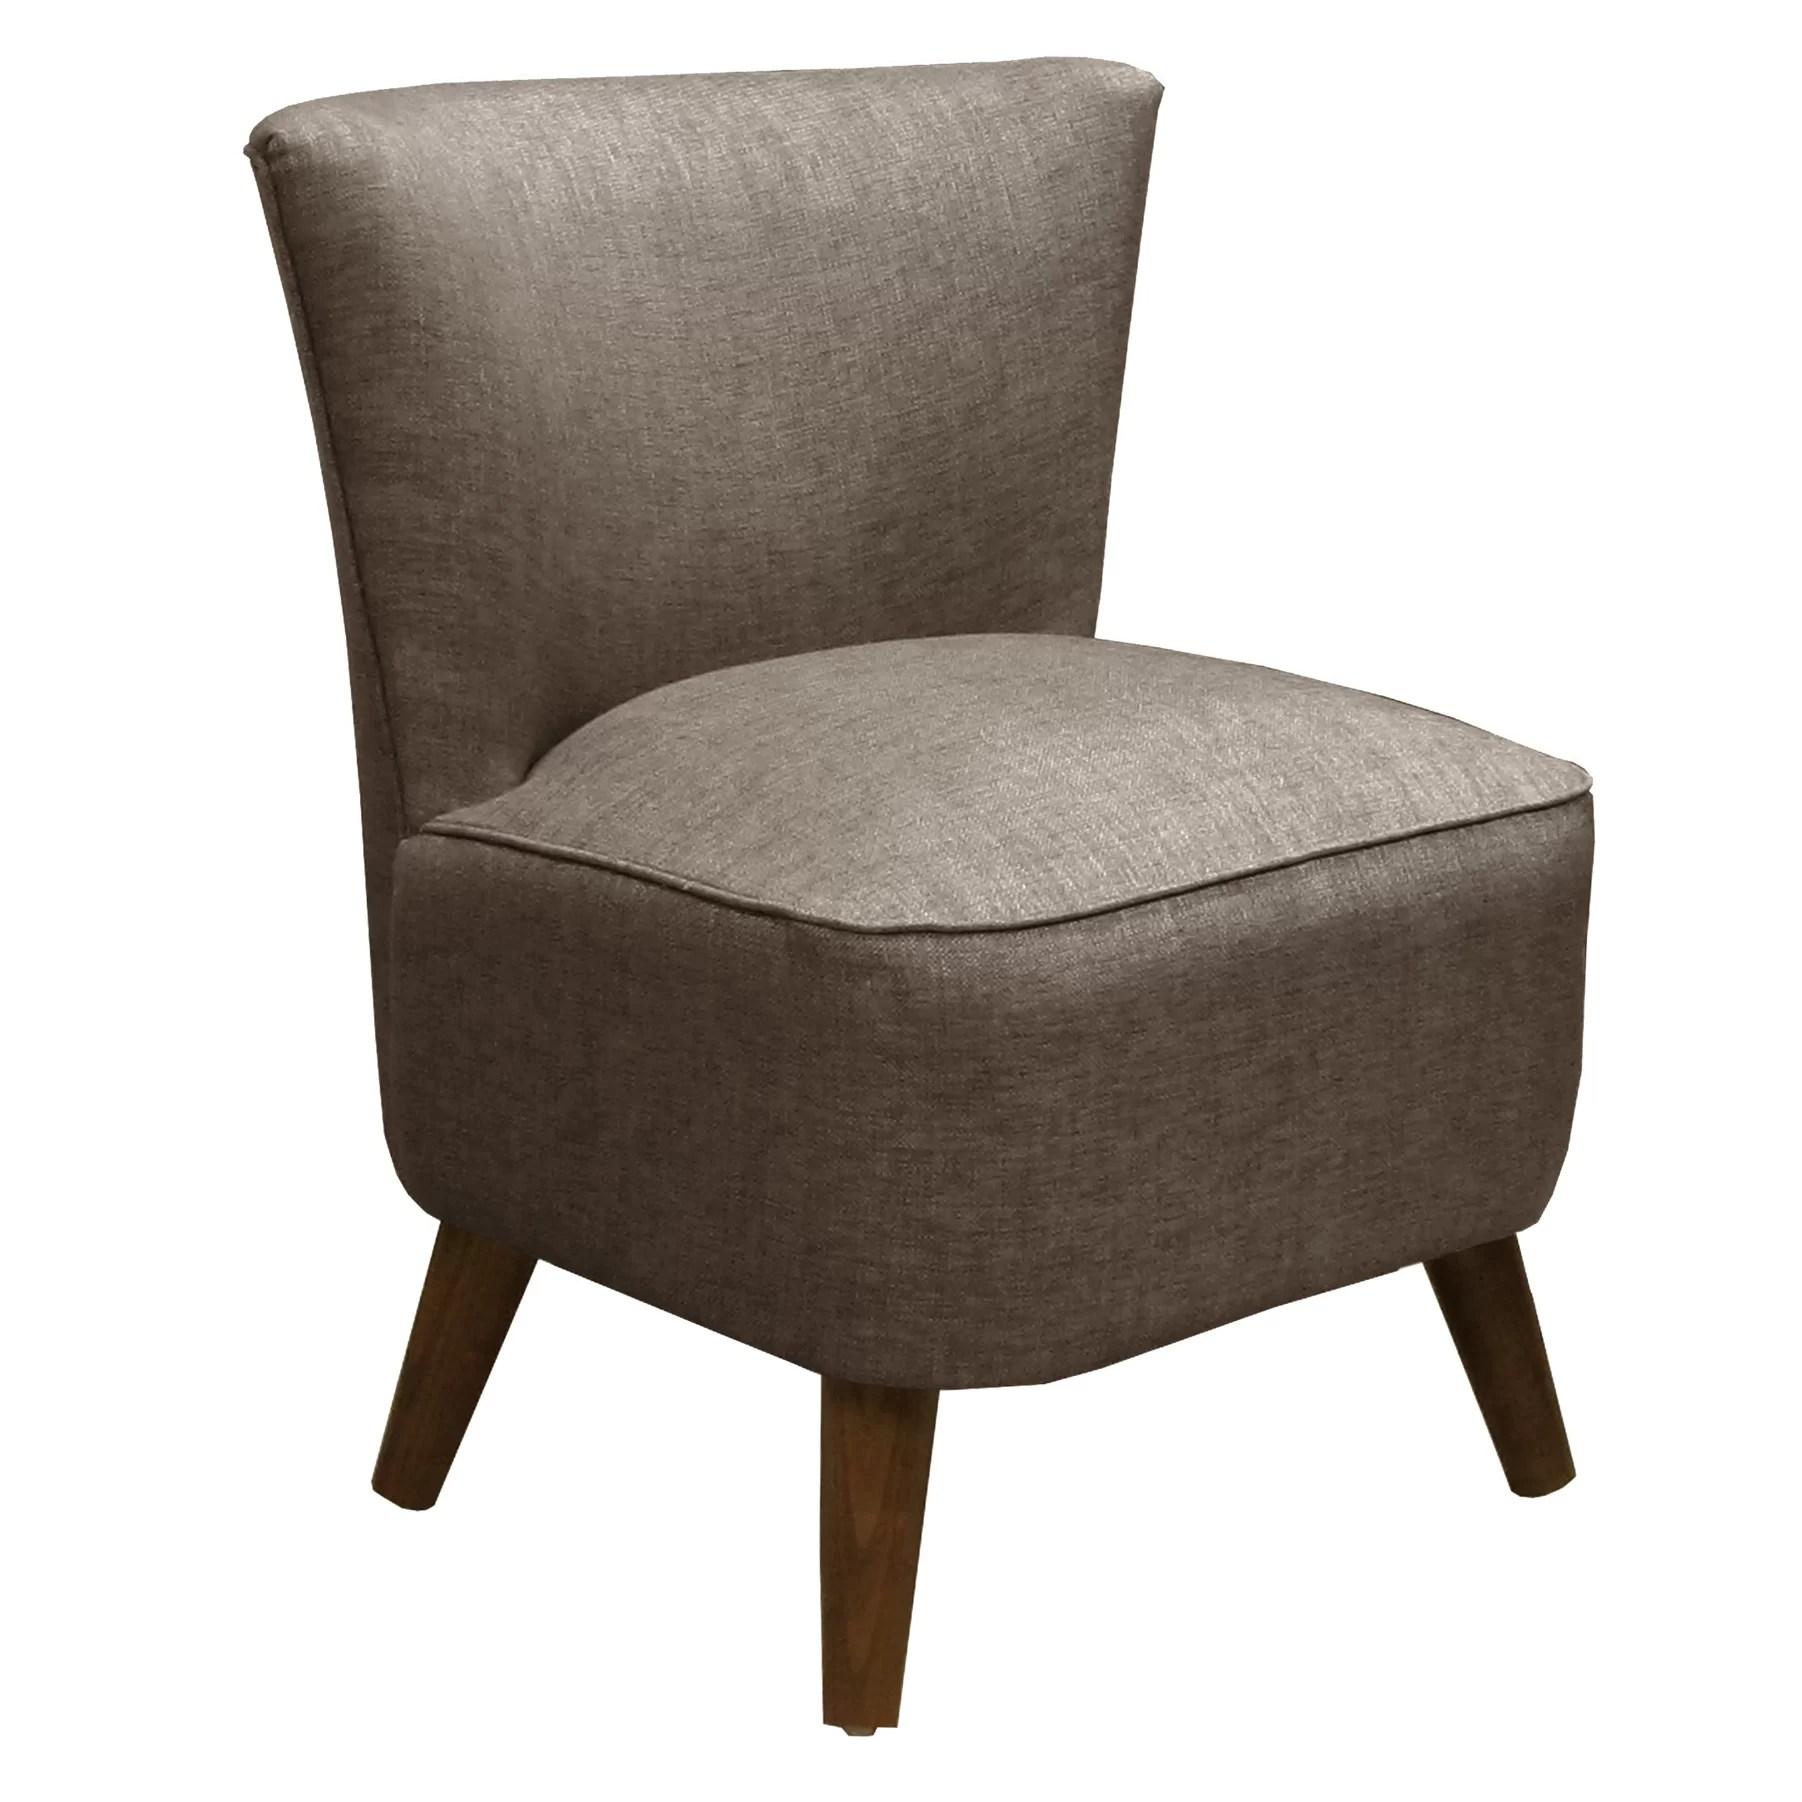 Skyline Furniture Groupie Mid Century Fabric Slipper Chair